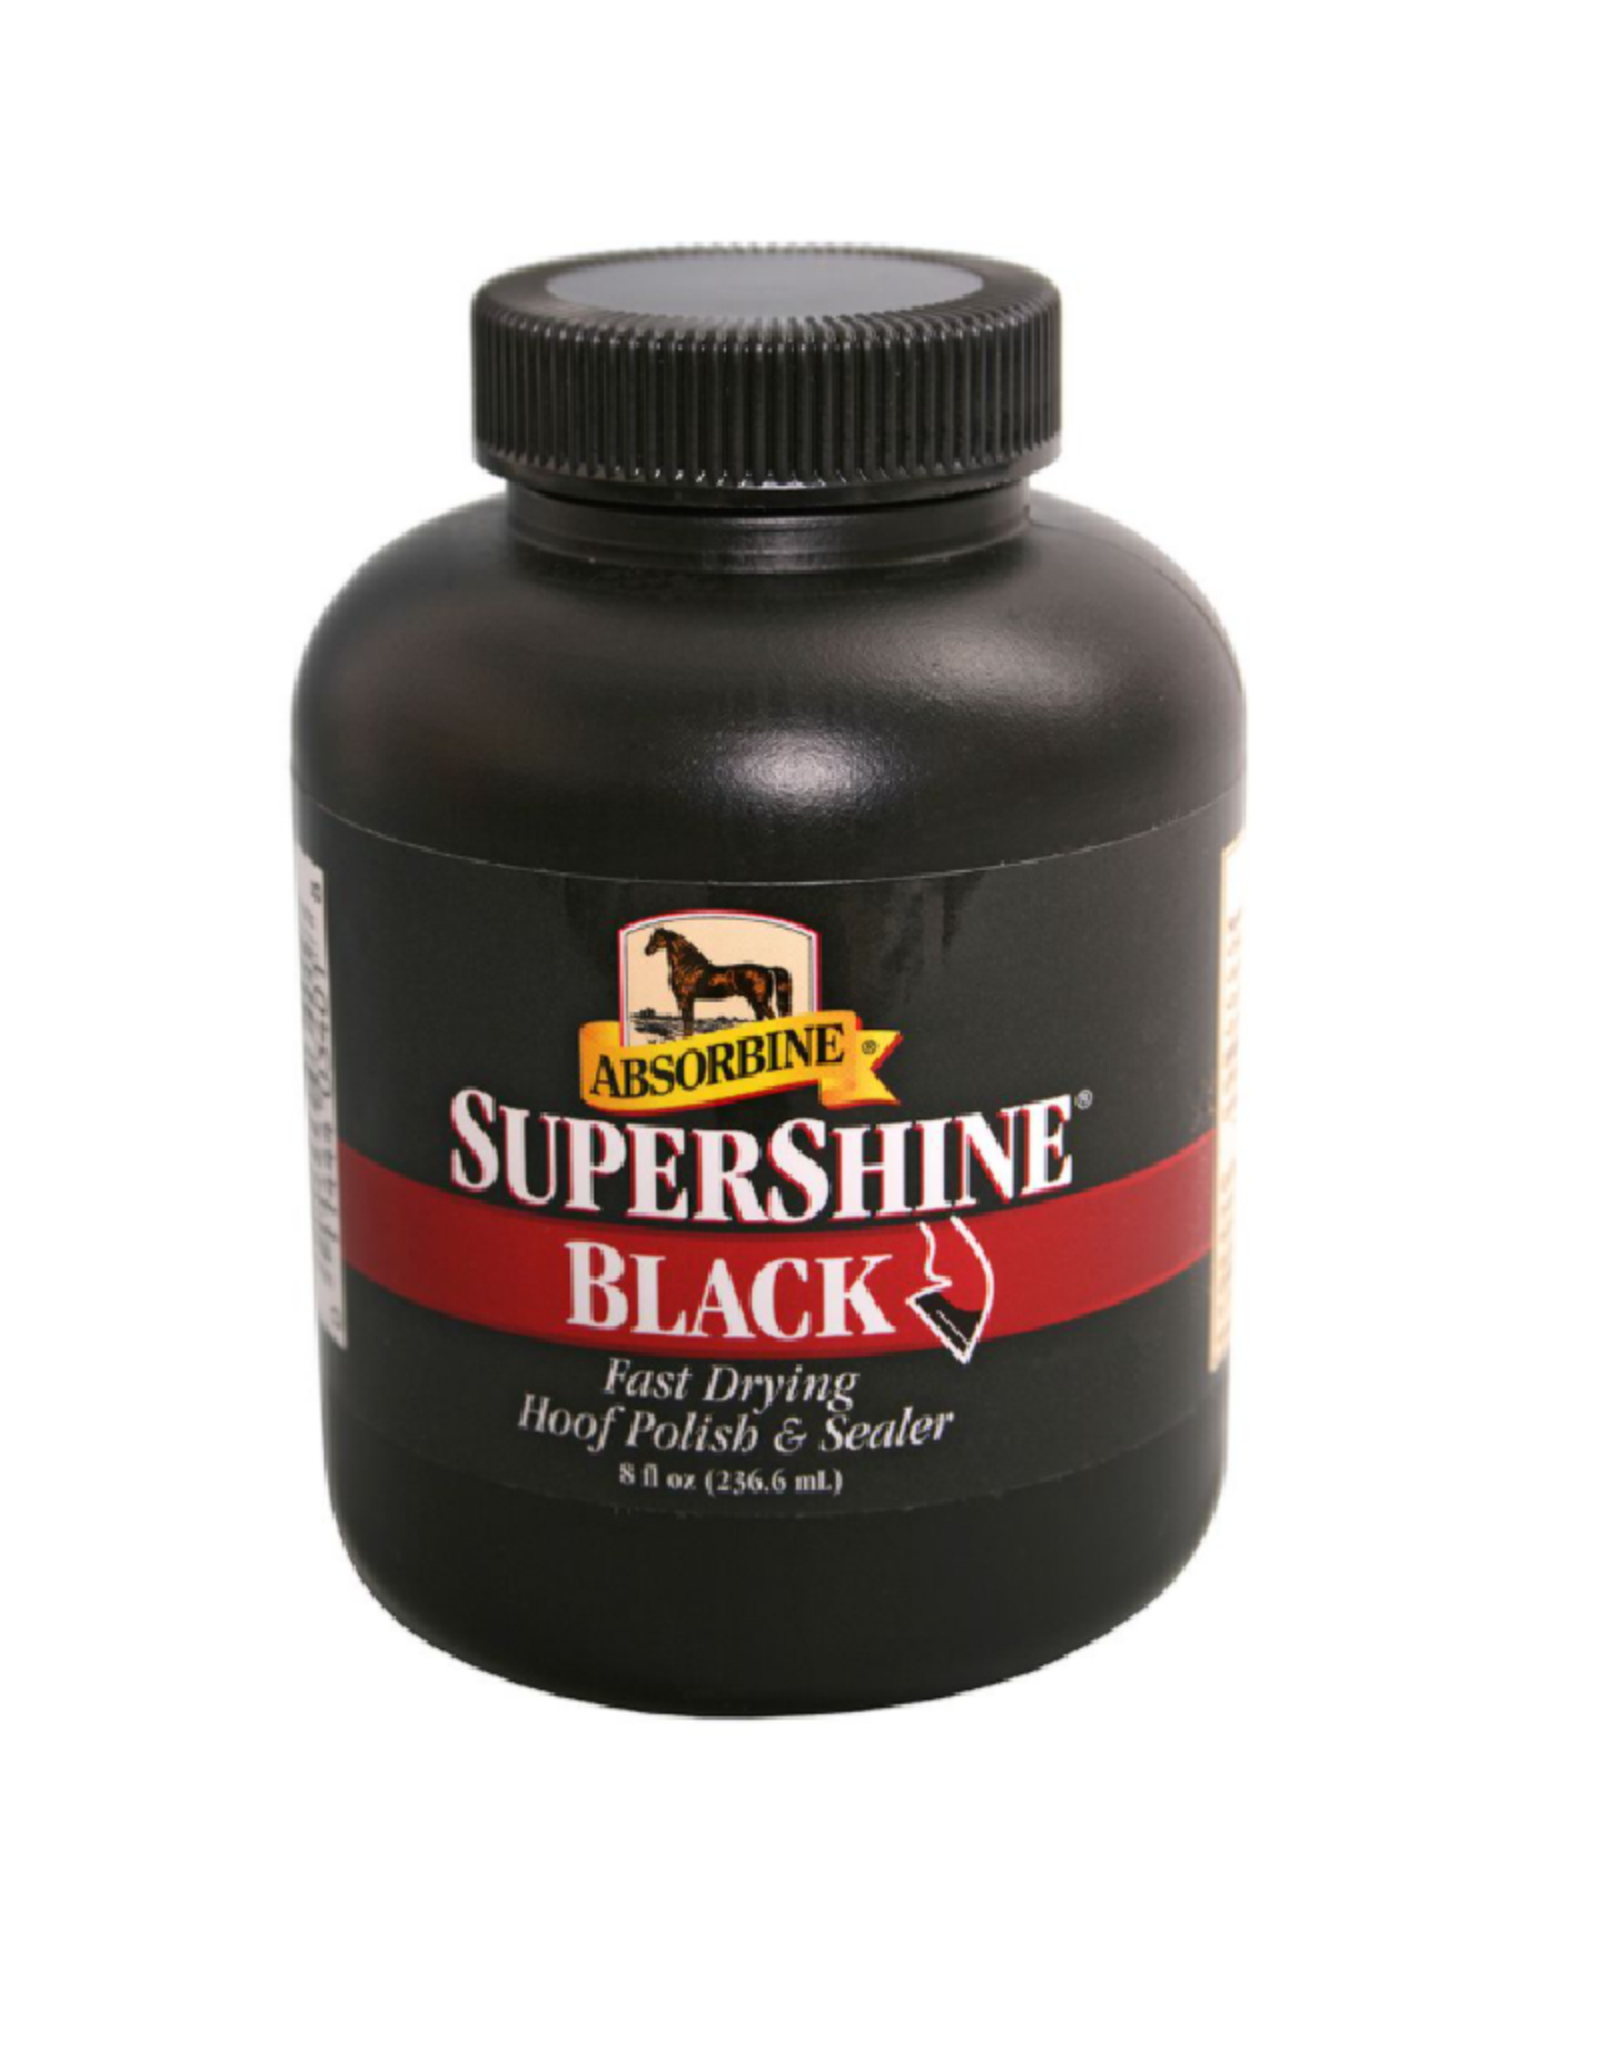 Absorbine Absorbine supershine 236,6ml